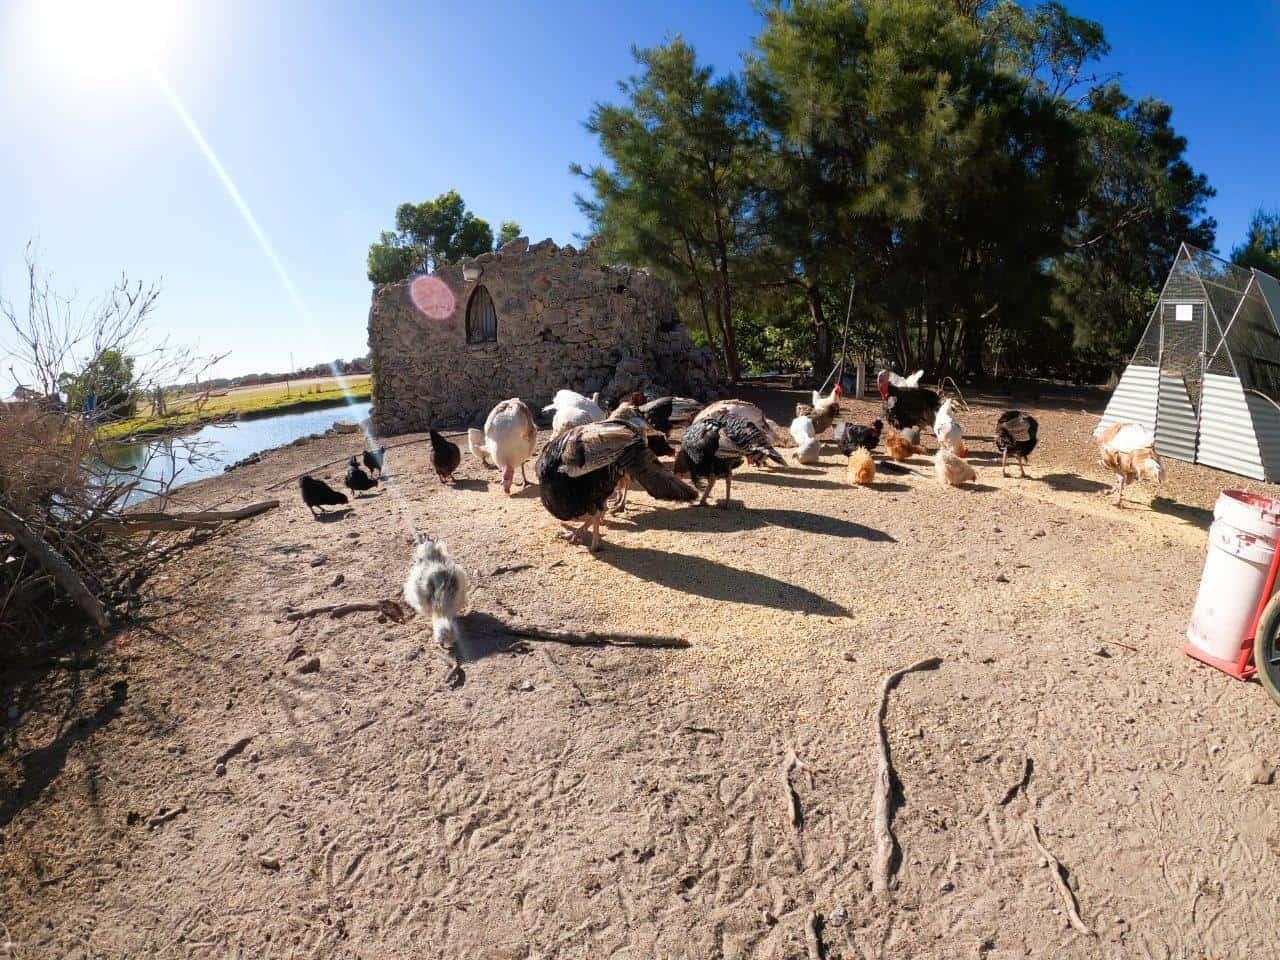 Ducks and Chooks on the island